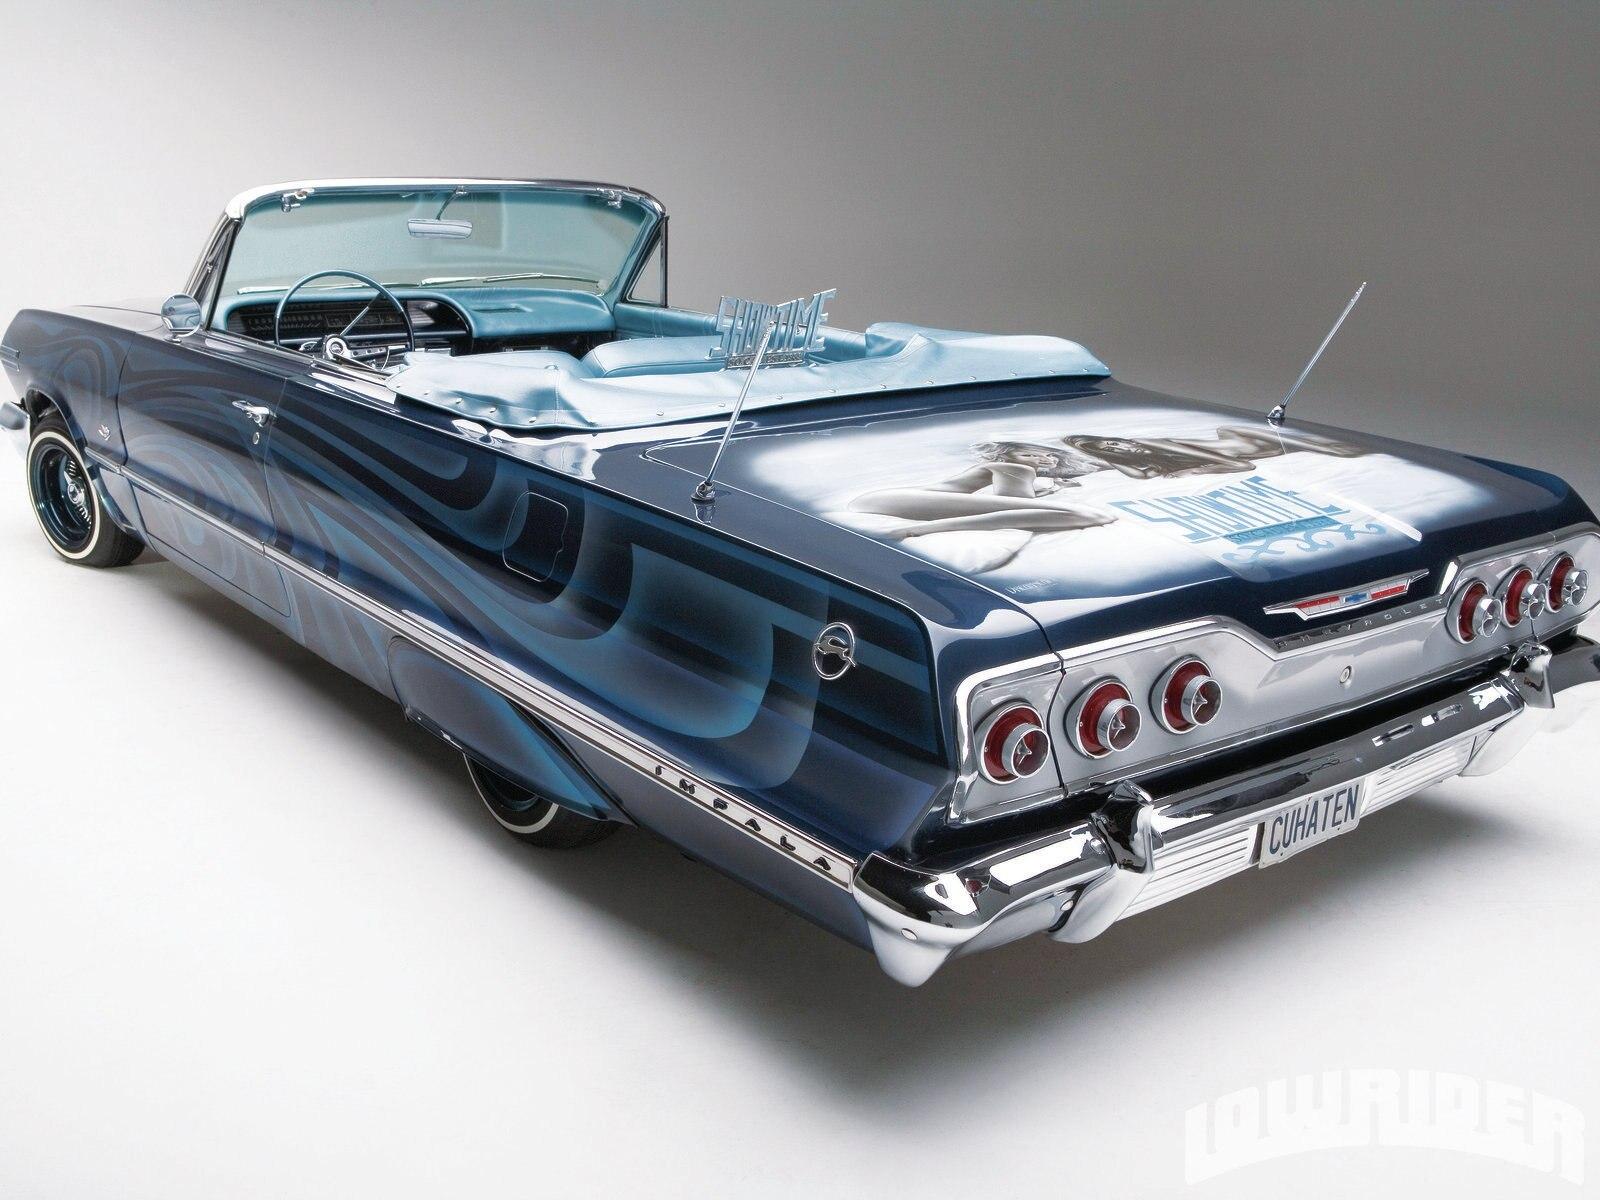 Lowrider Wallpaper Impala 63